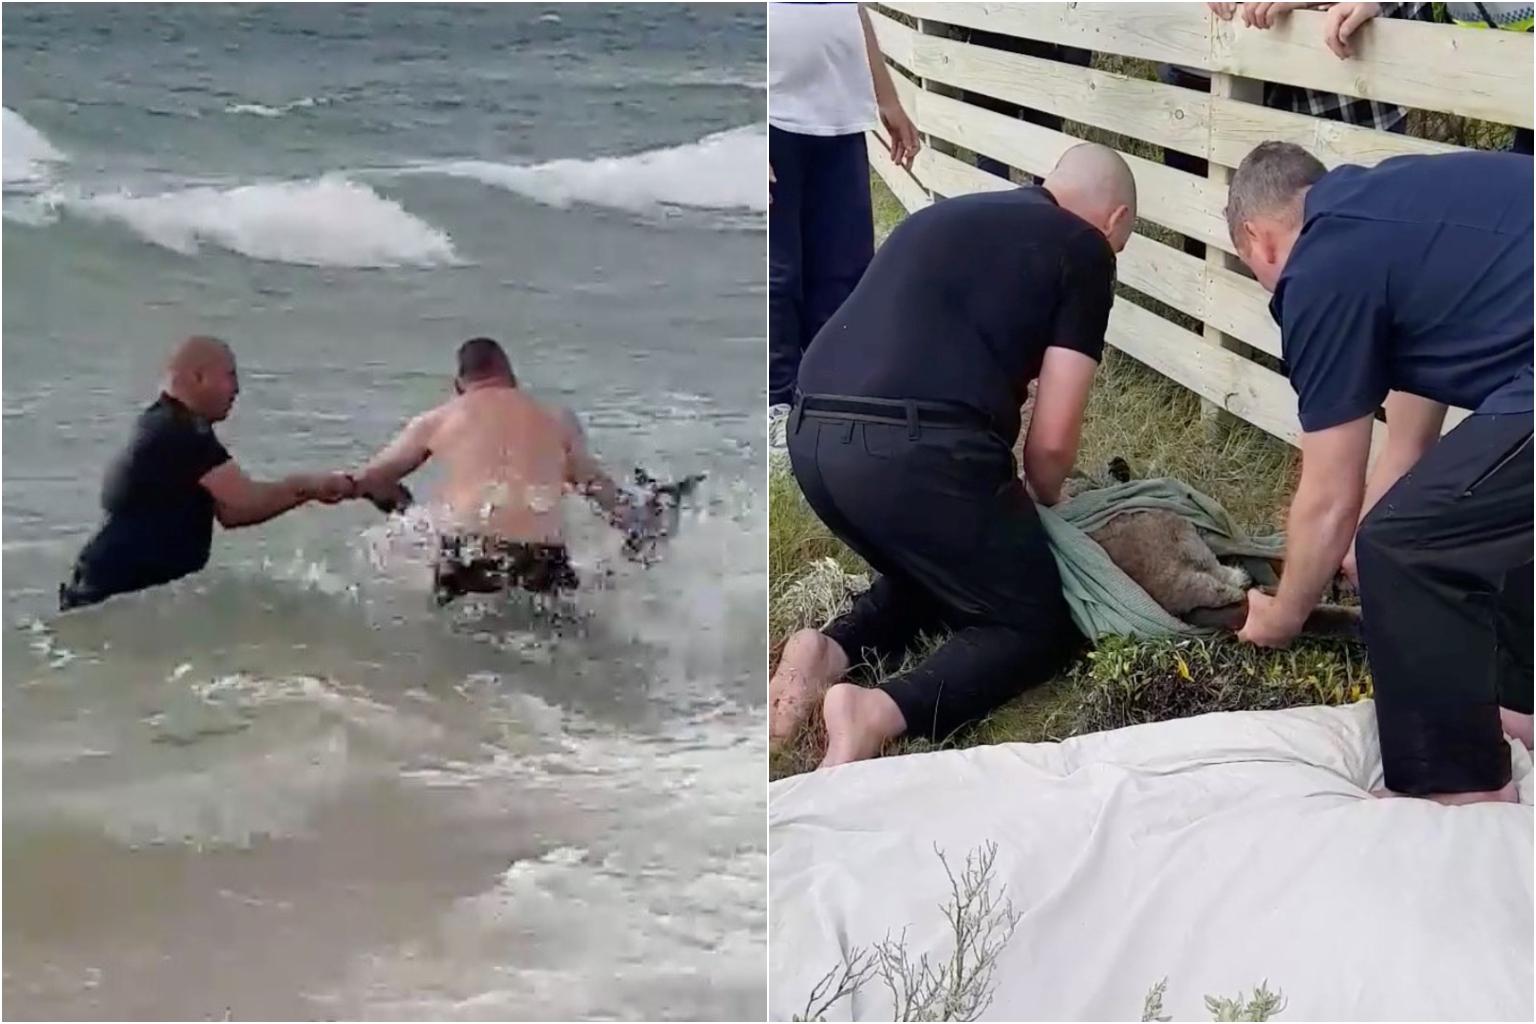 Police in Australia rescue drowning kangaroo